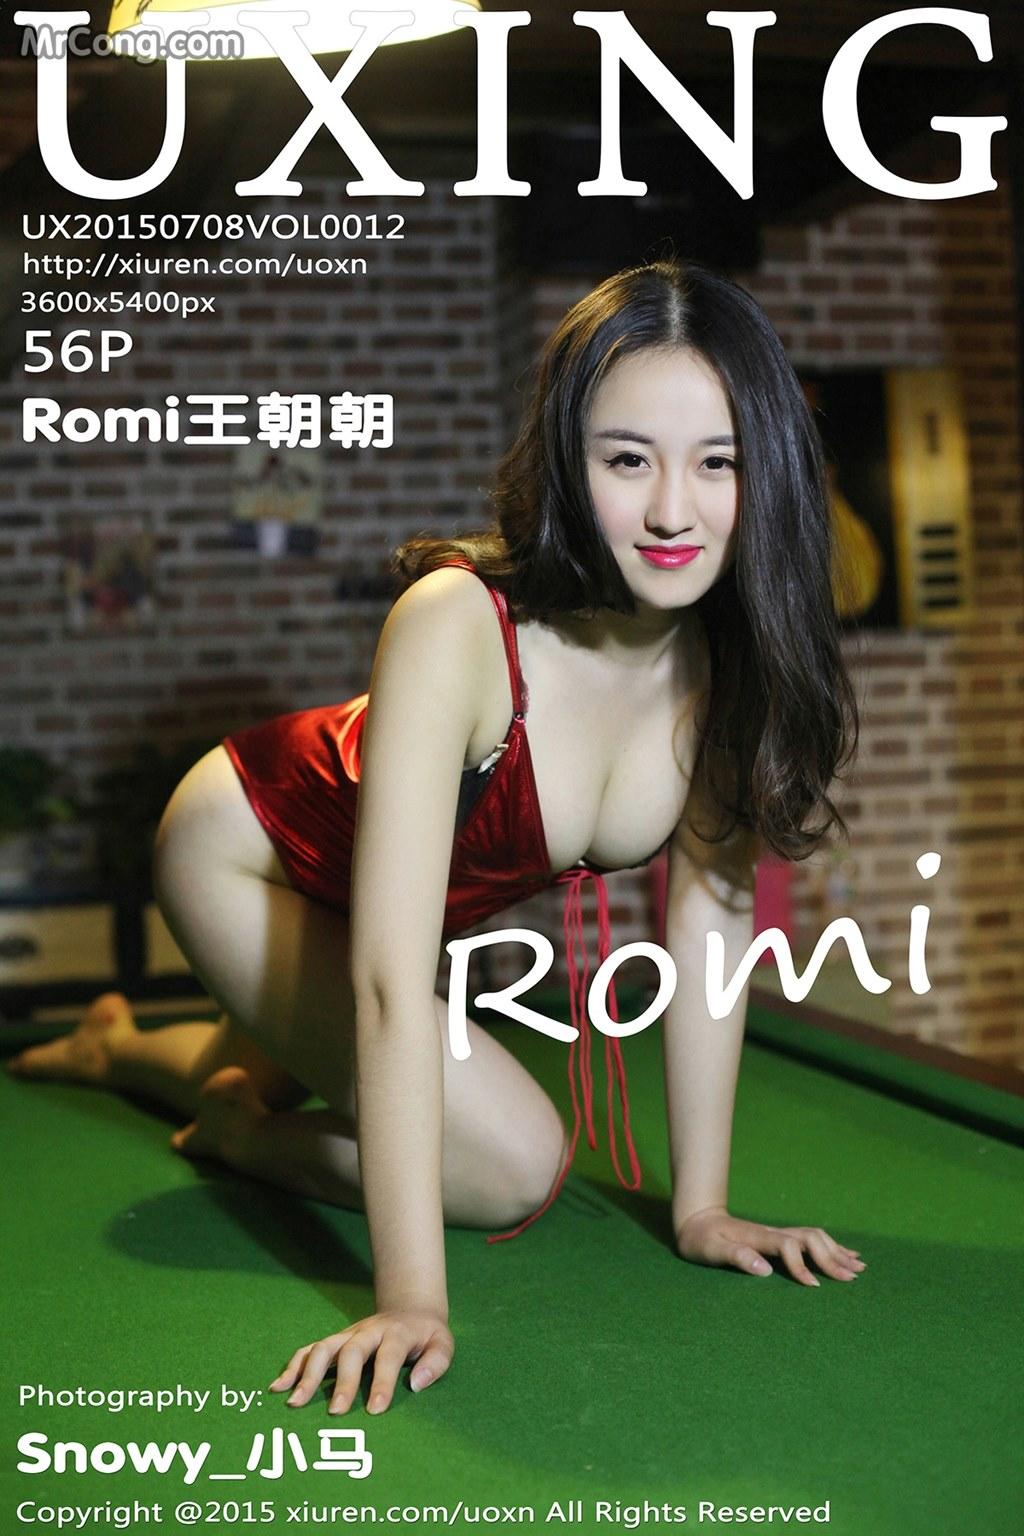 UXING Vol.012: Model Romi (王朝朝) (57 photos)